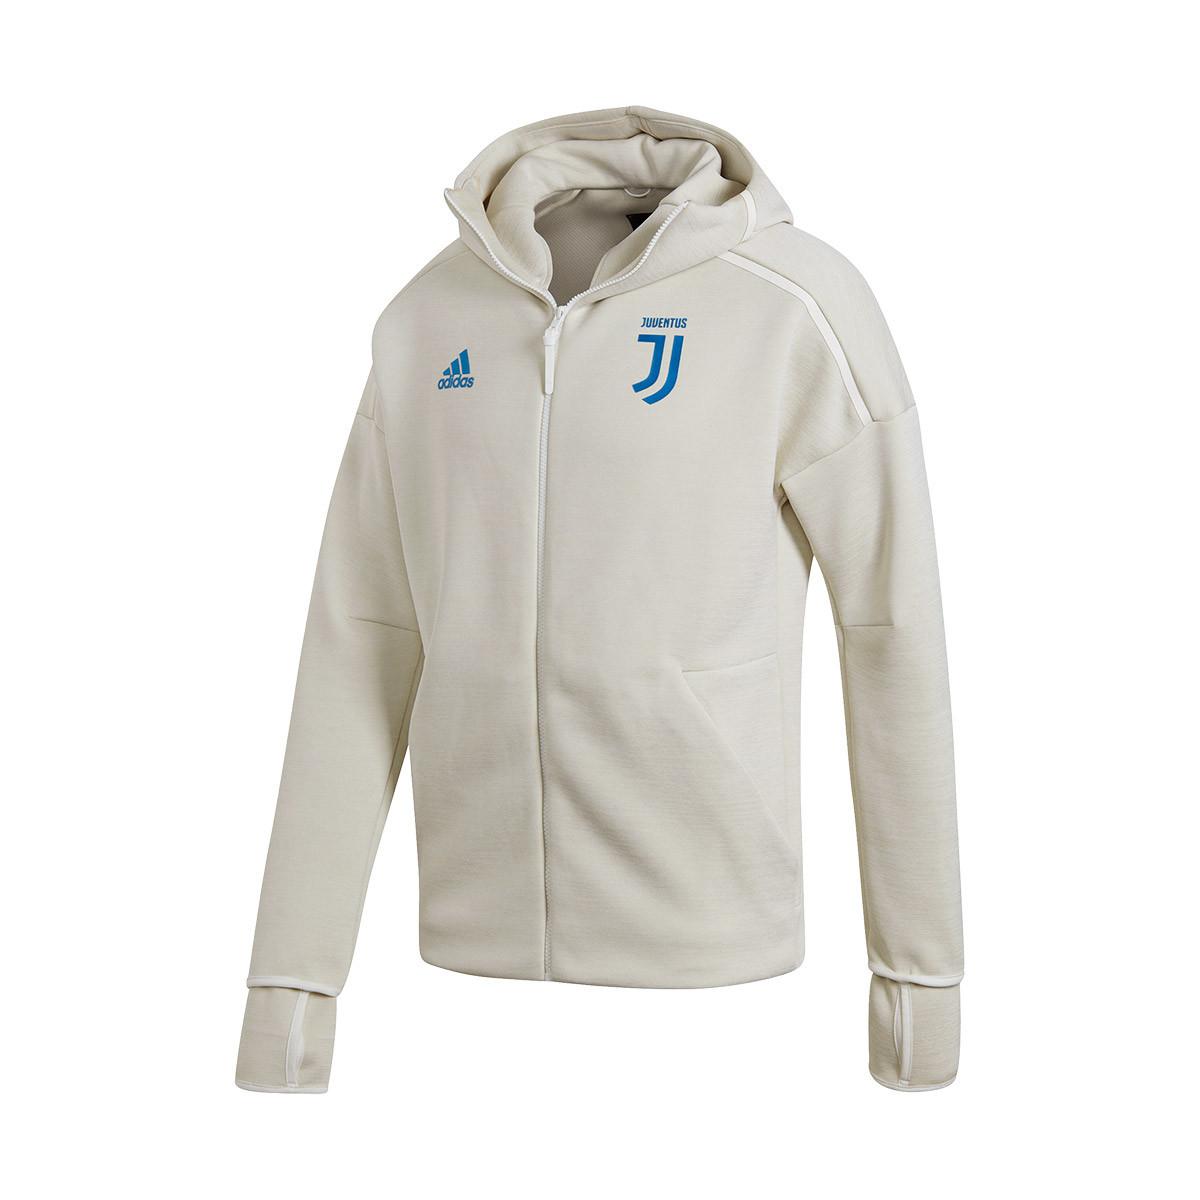 Promesa Hacer deporte Ideal  Sudadera adidas Juventus ZNE HD 2019-2020 Core white-Raw white - Tienda de  fútbol Fútbol Emotion